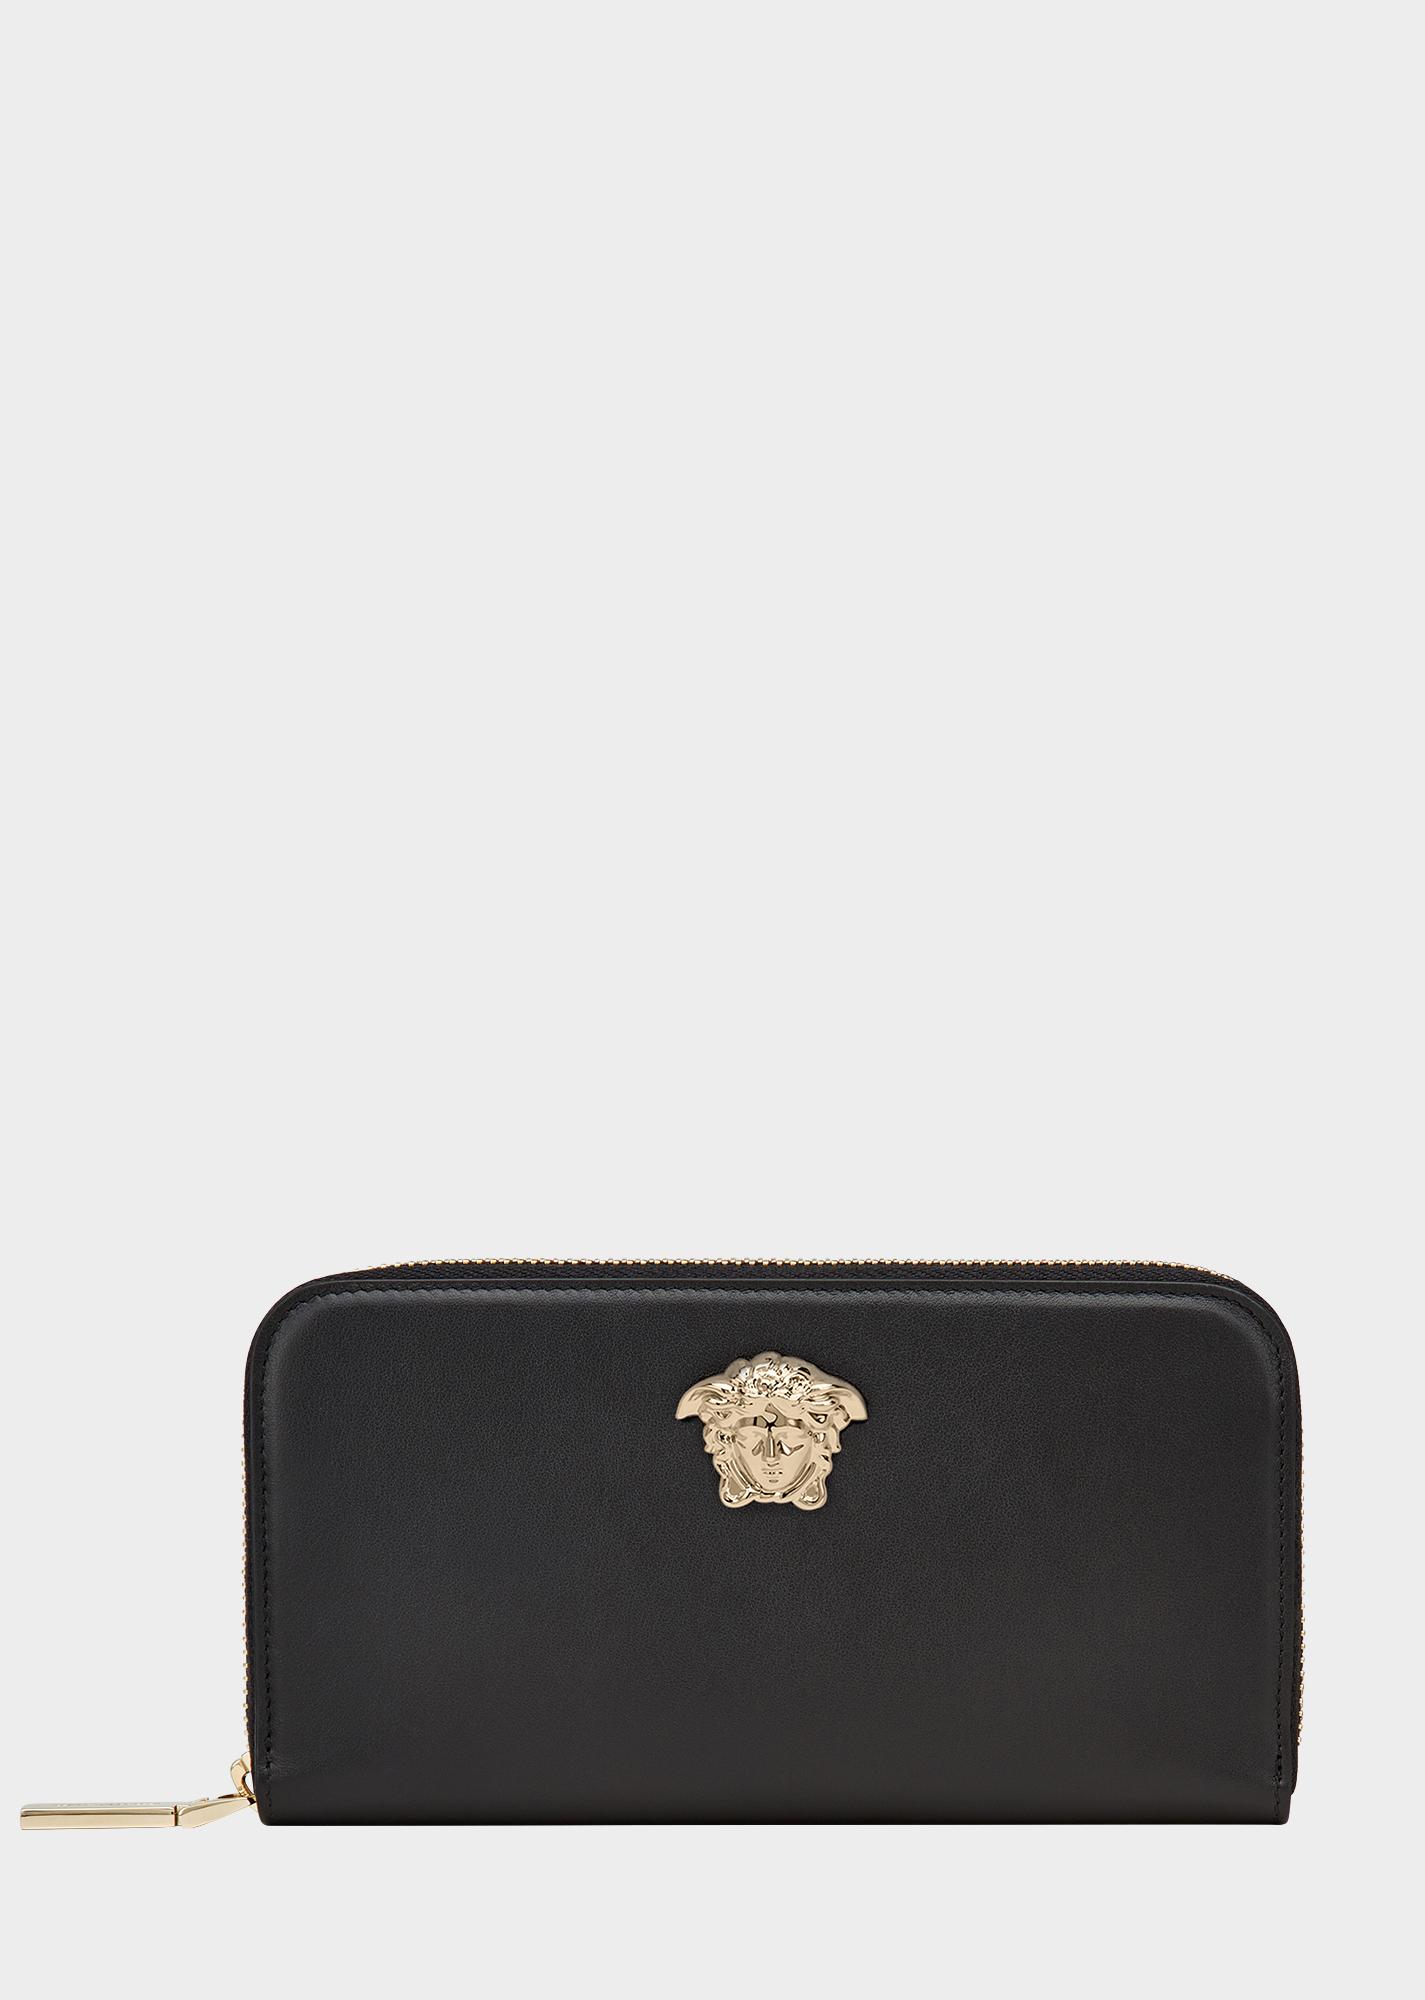 79e8bf19cf6c Palazzo Zip Leather Wallet - Black Small Accessories